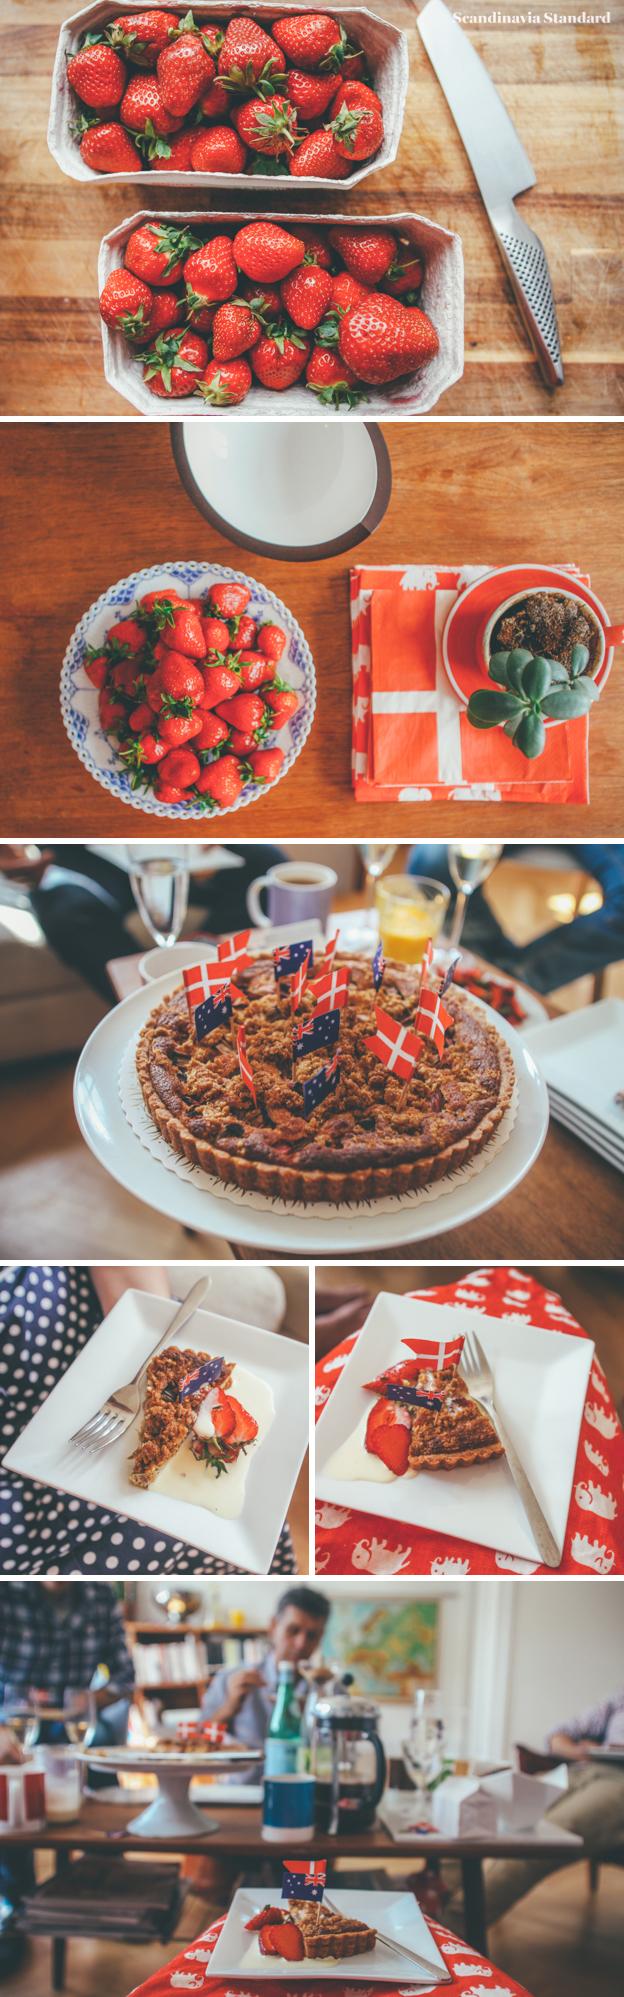 7. Danish Brunch with Rhubarb Pie | Scandinavia Standard